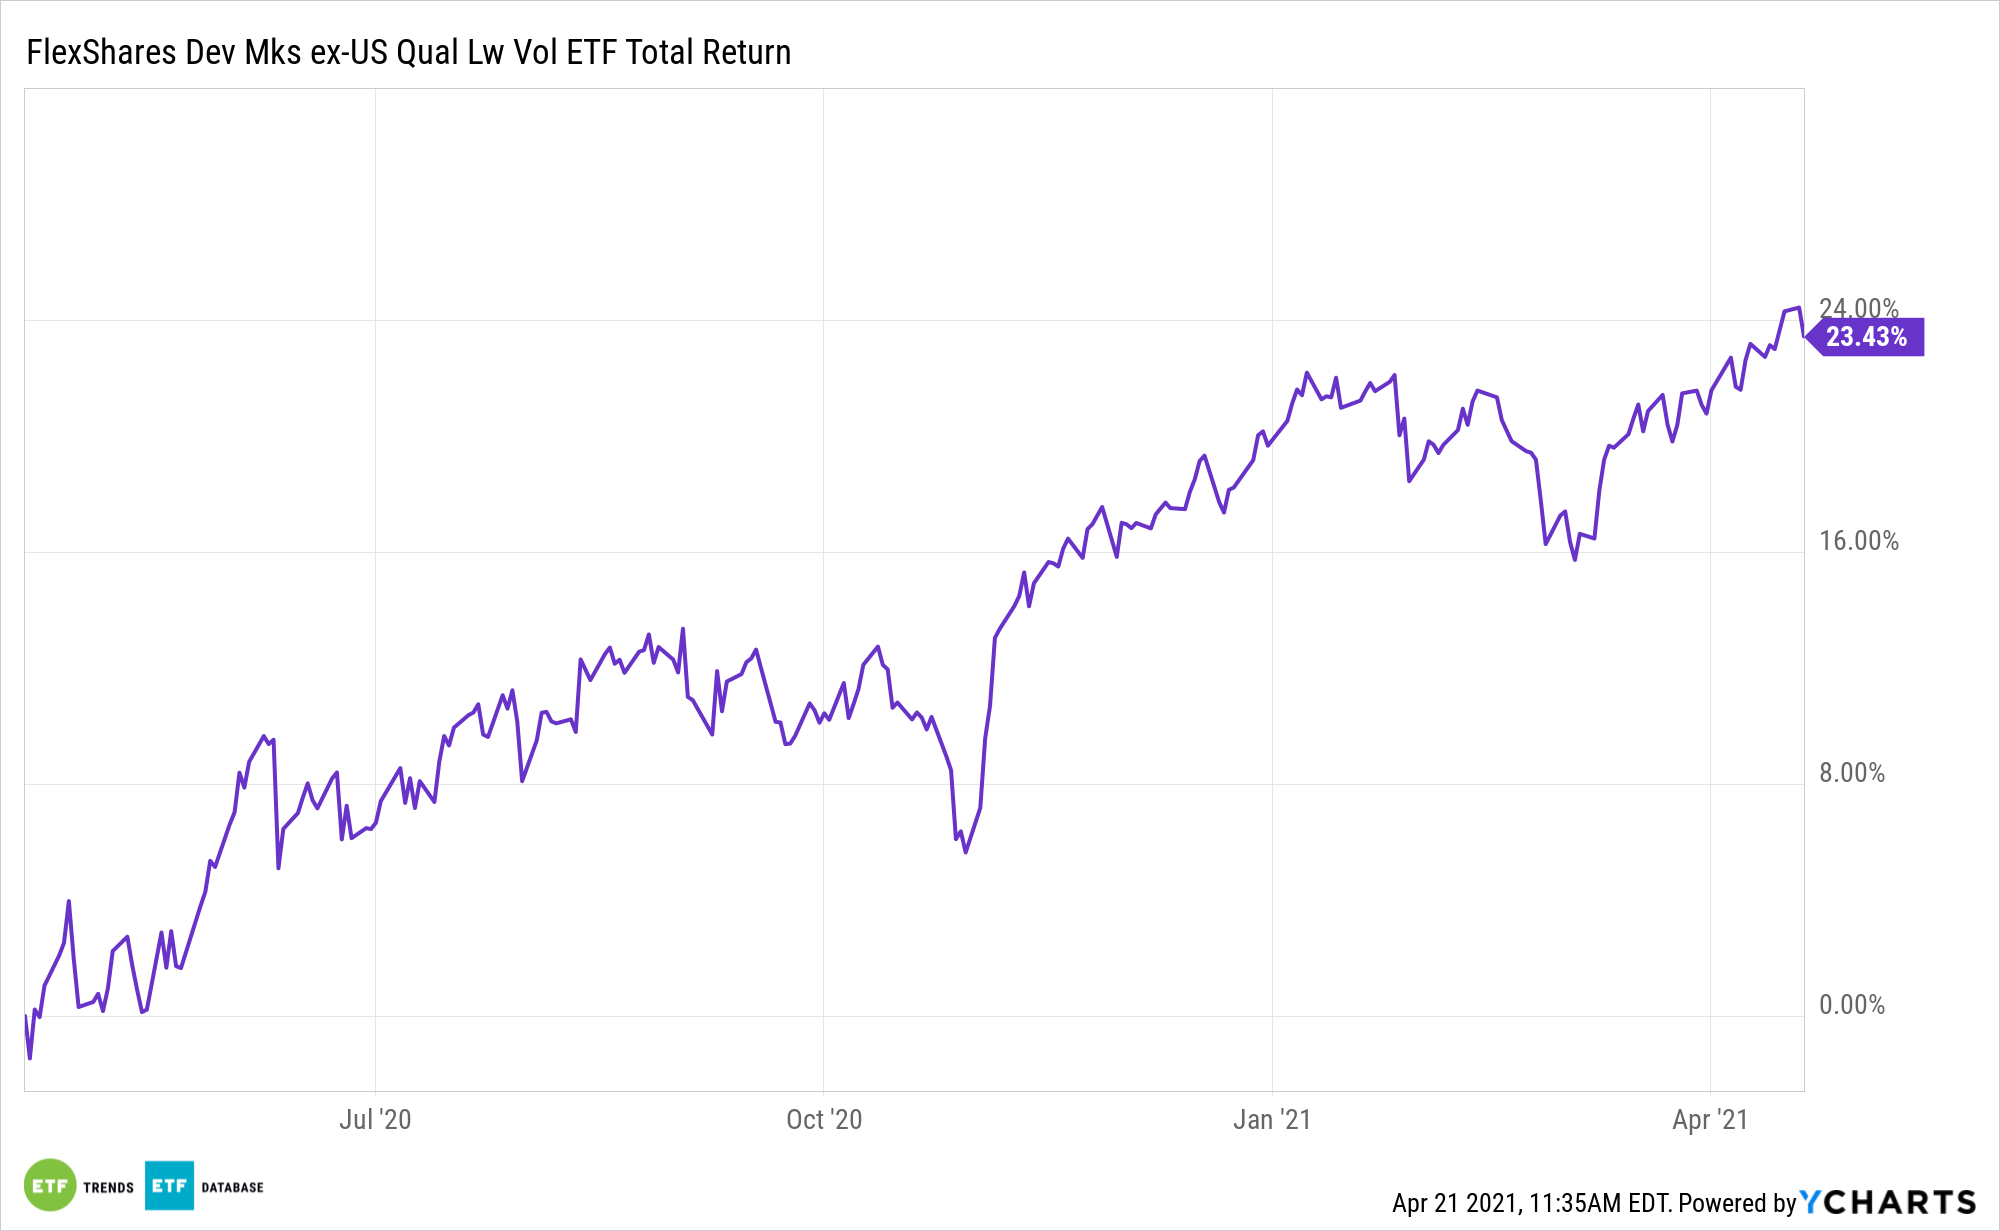 QLVD 1 Year Total Return